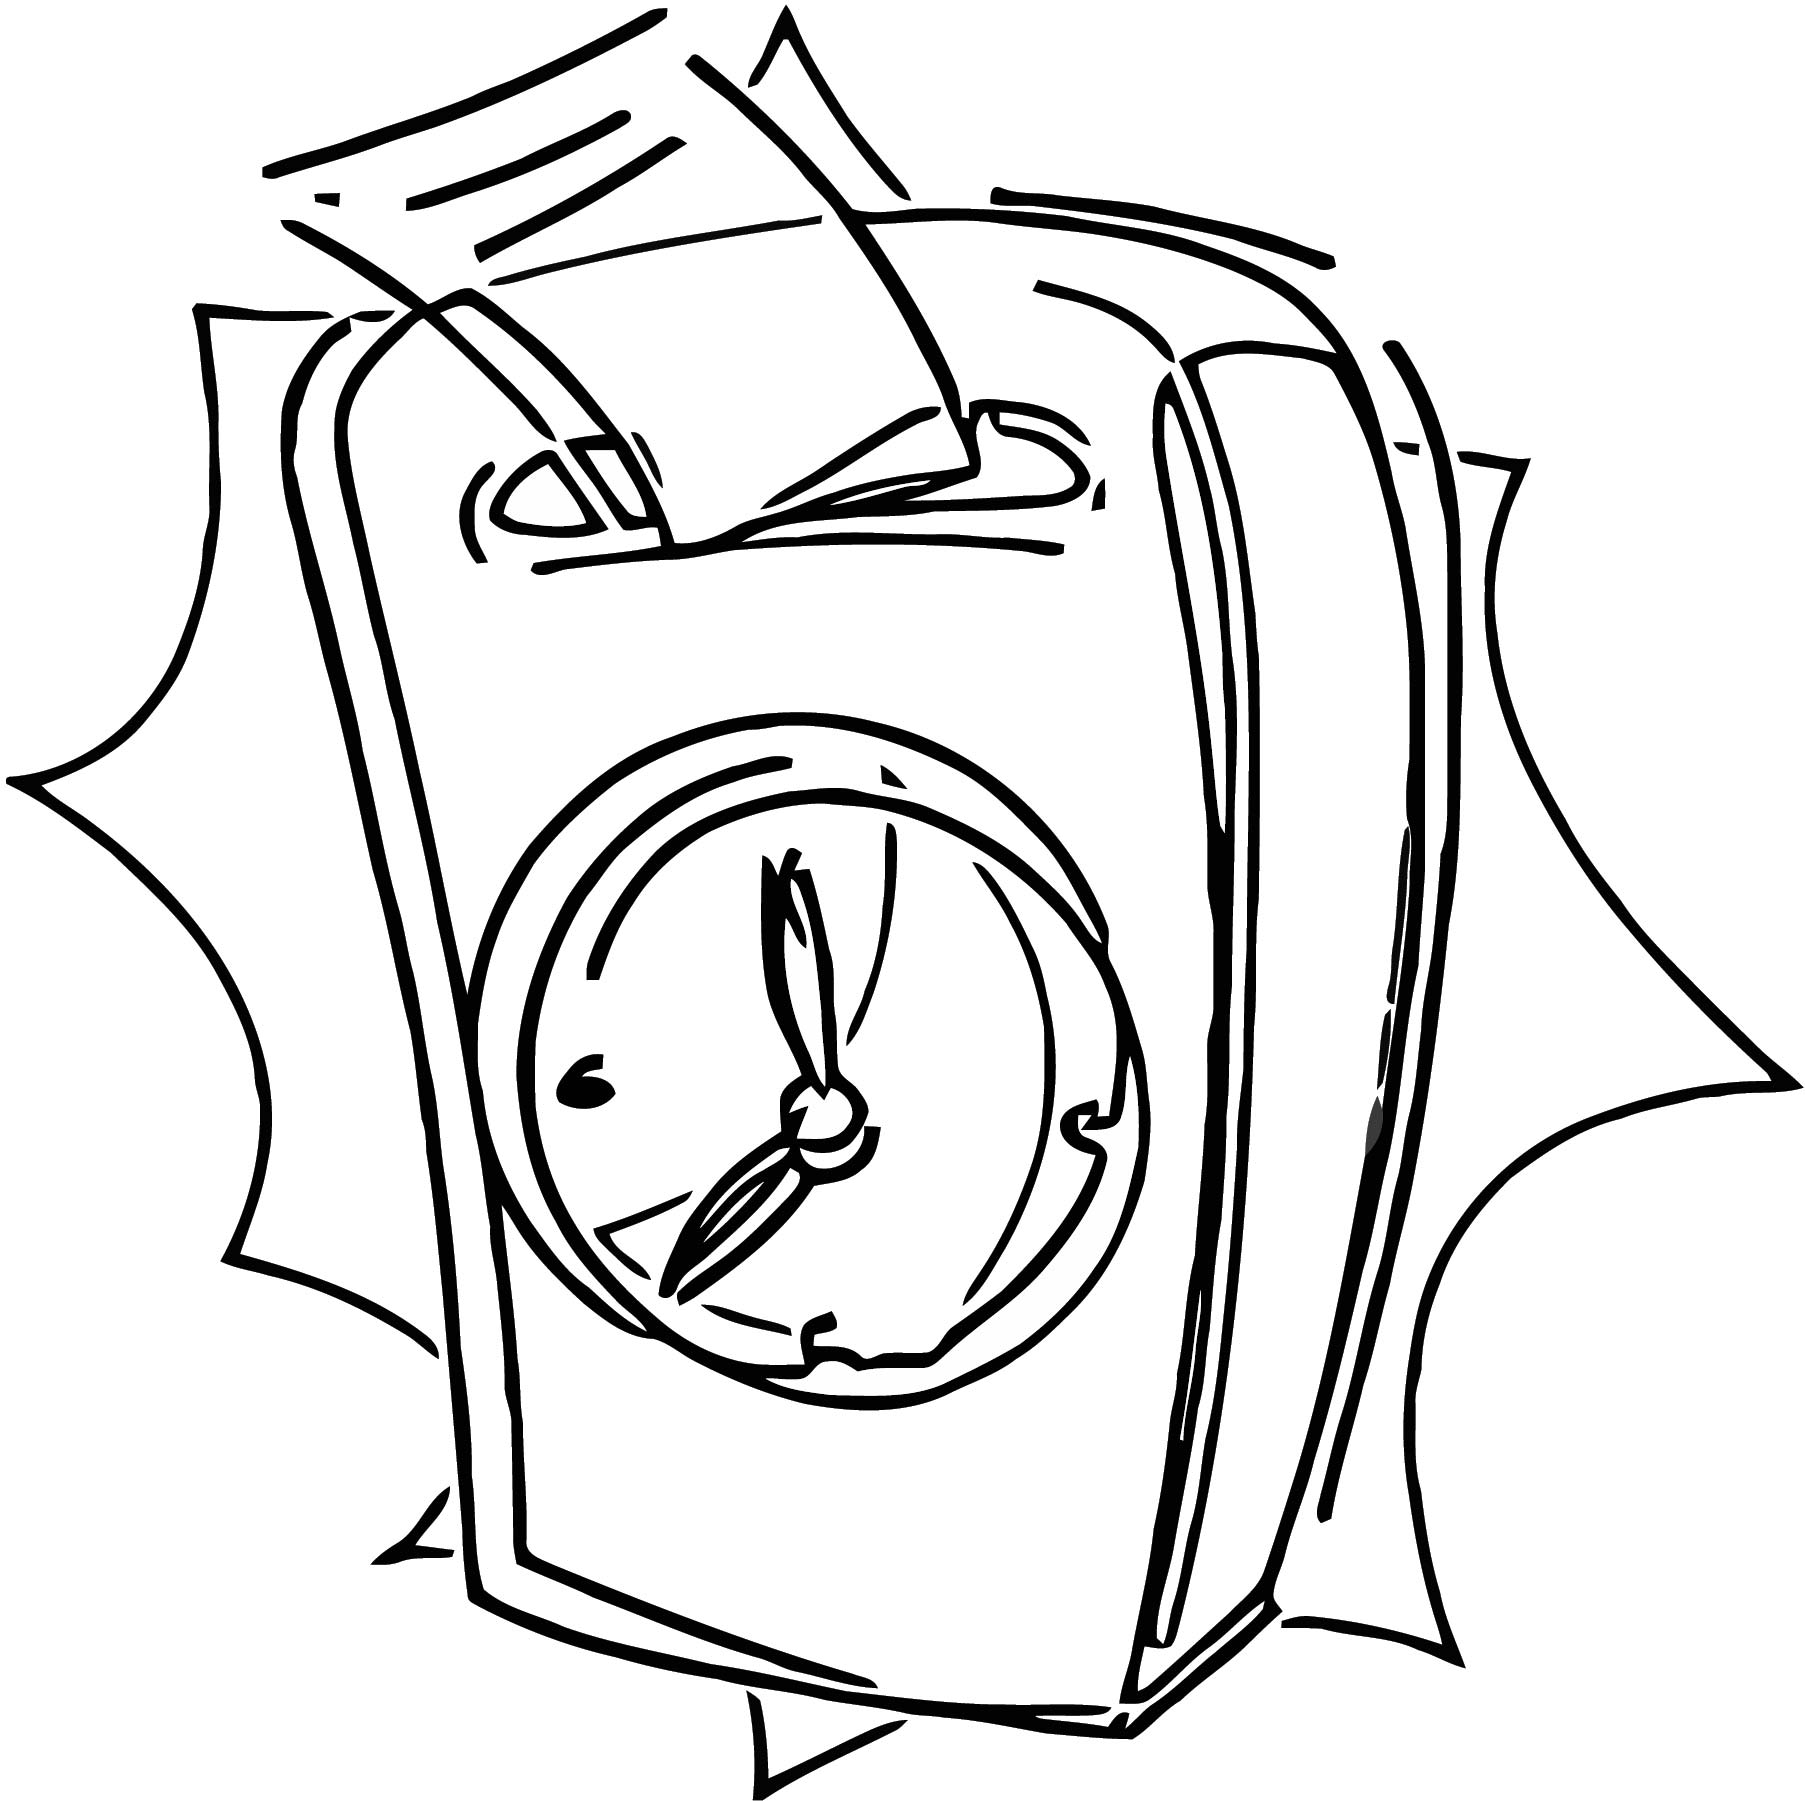 Time Clock Free Printable 1 Cartoonized Free Printable Coloring Page